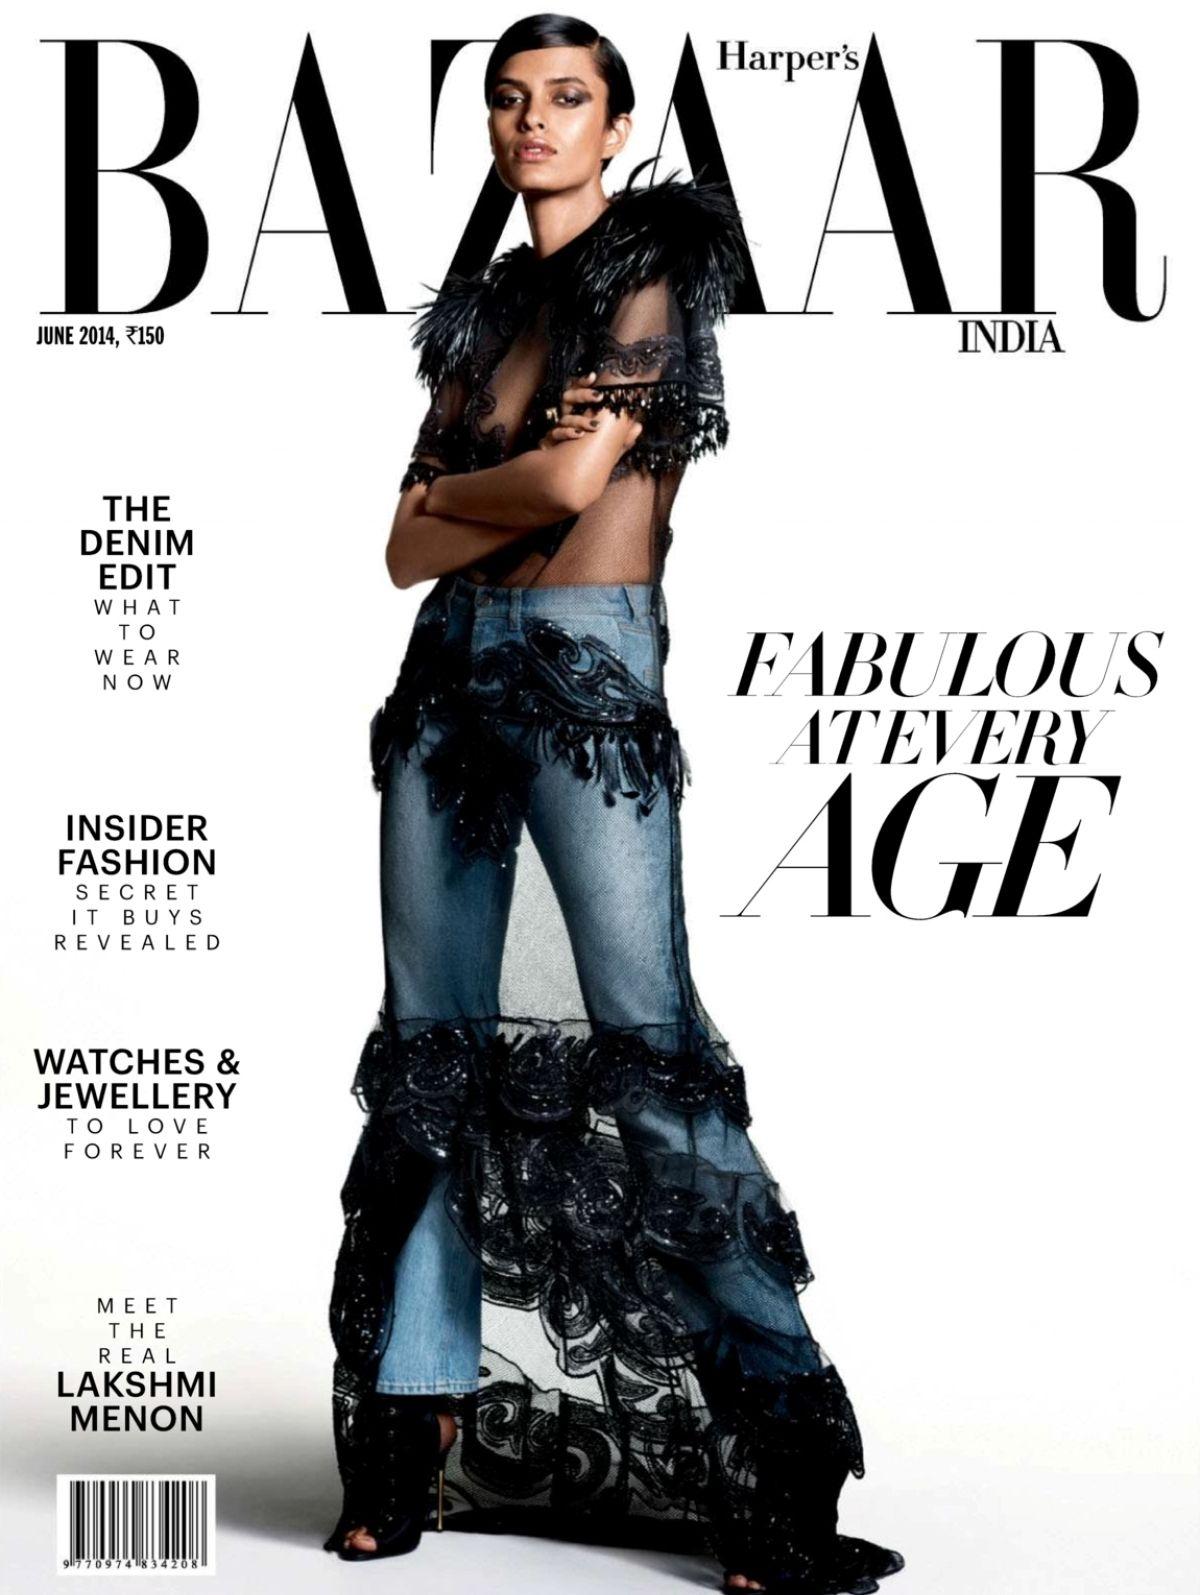 Harper's Bazaar India Junho 2014 | Lakshmi Menon por Tarun Vishwa